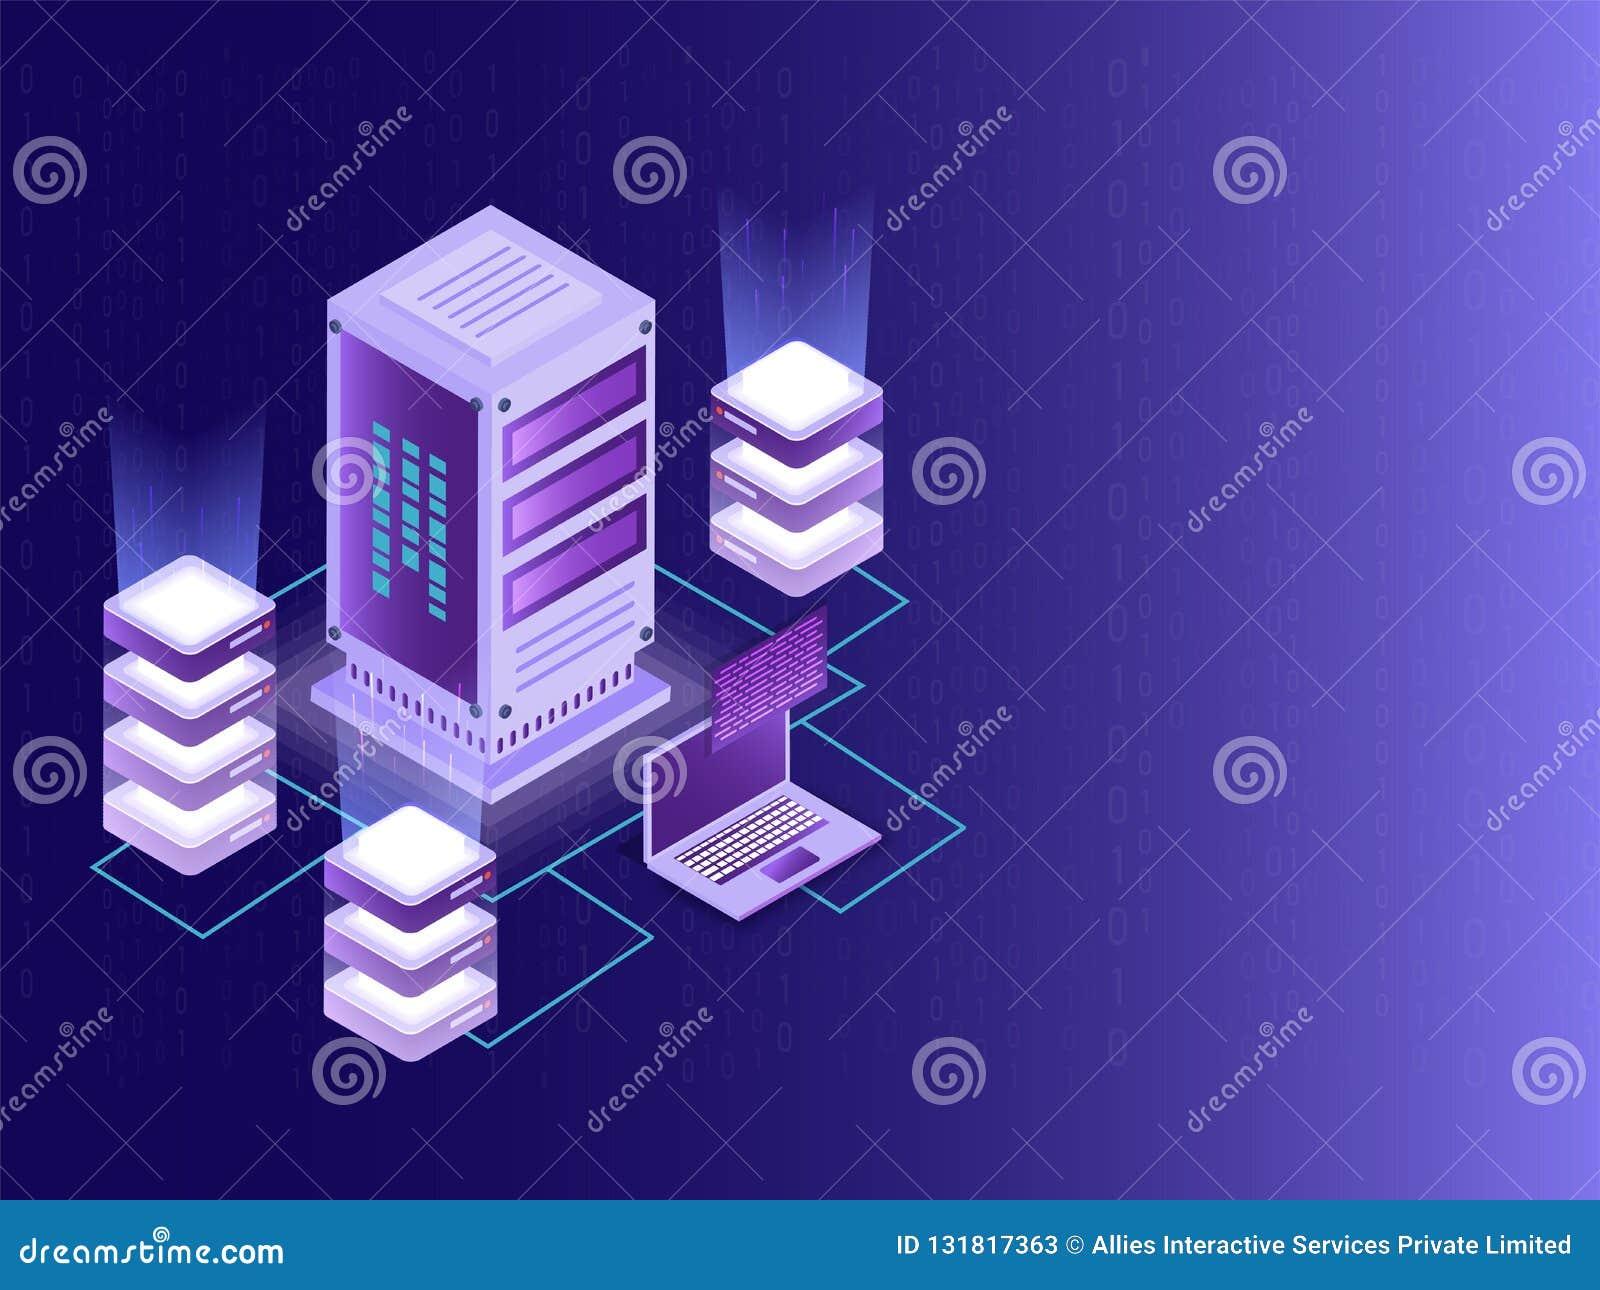 Isometric σχέδιο για το κέντρο δεδομένων, το μεγάλο κεντρικό υπολογιστή στοιχείων και το τοπικό serv